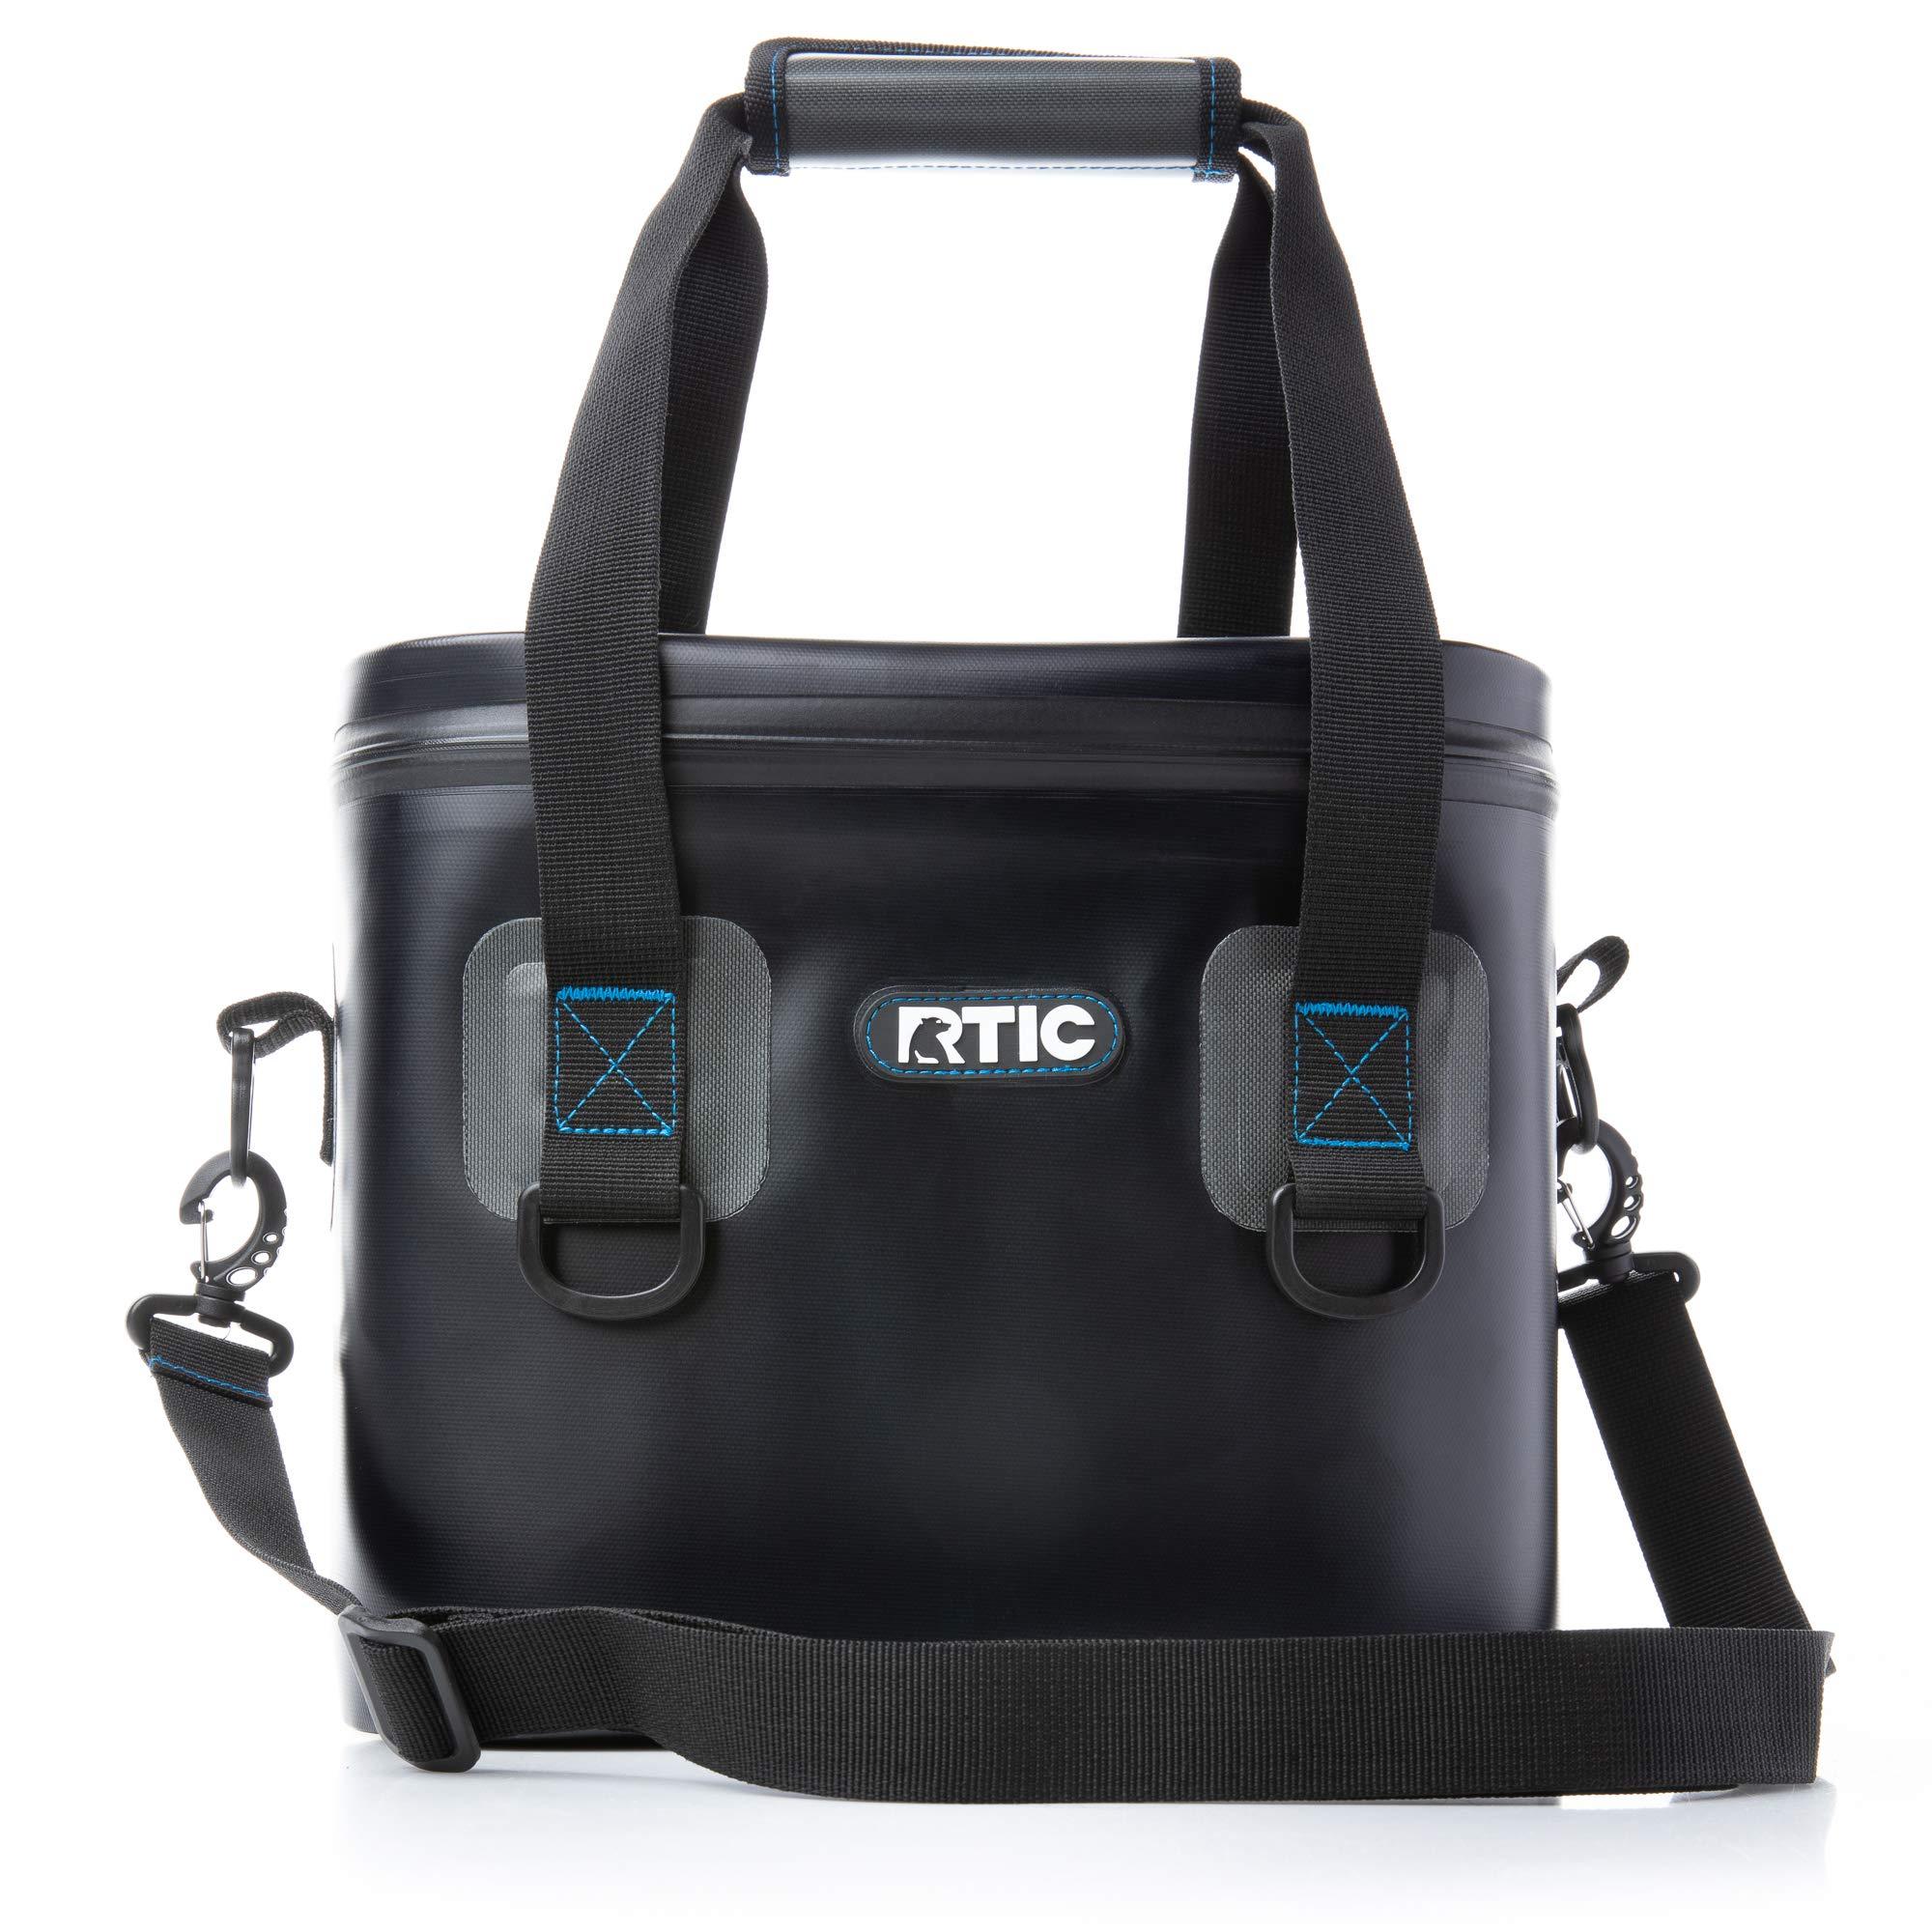 RTIC Soft Pack 8, Grey